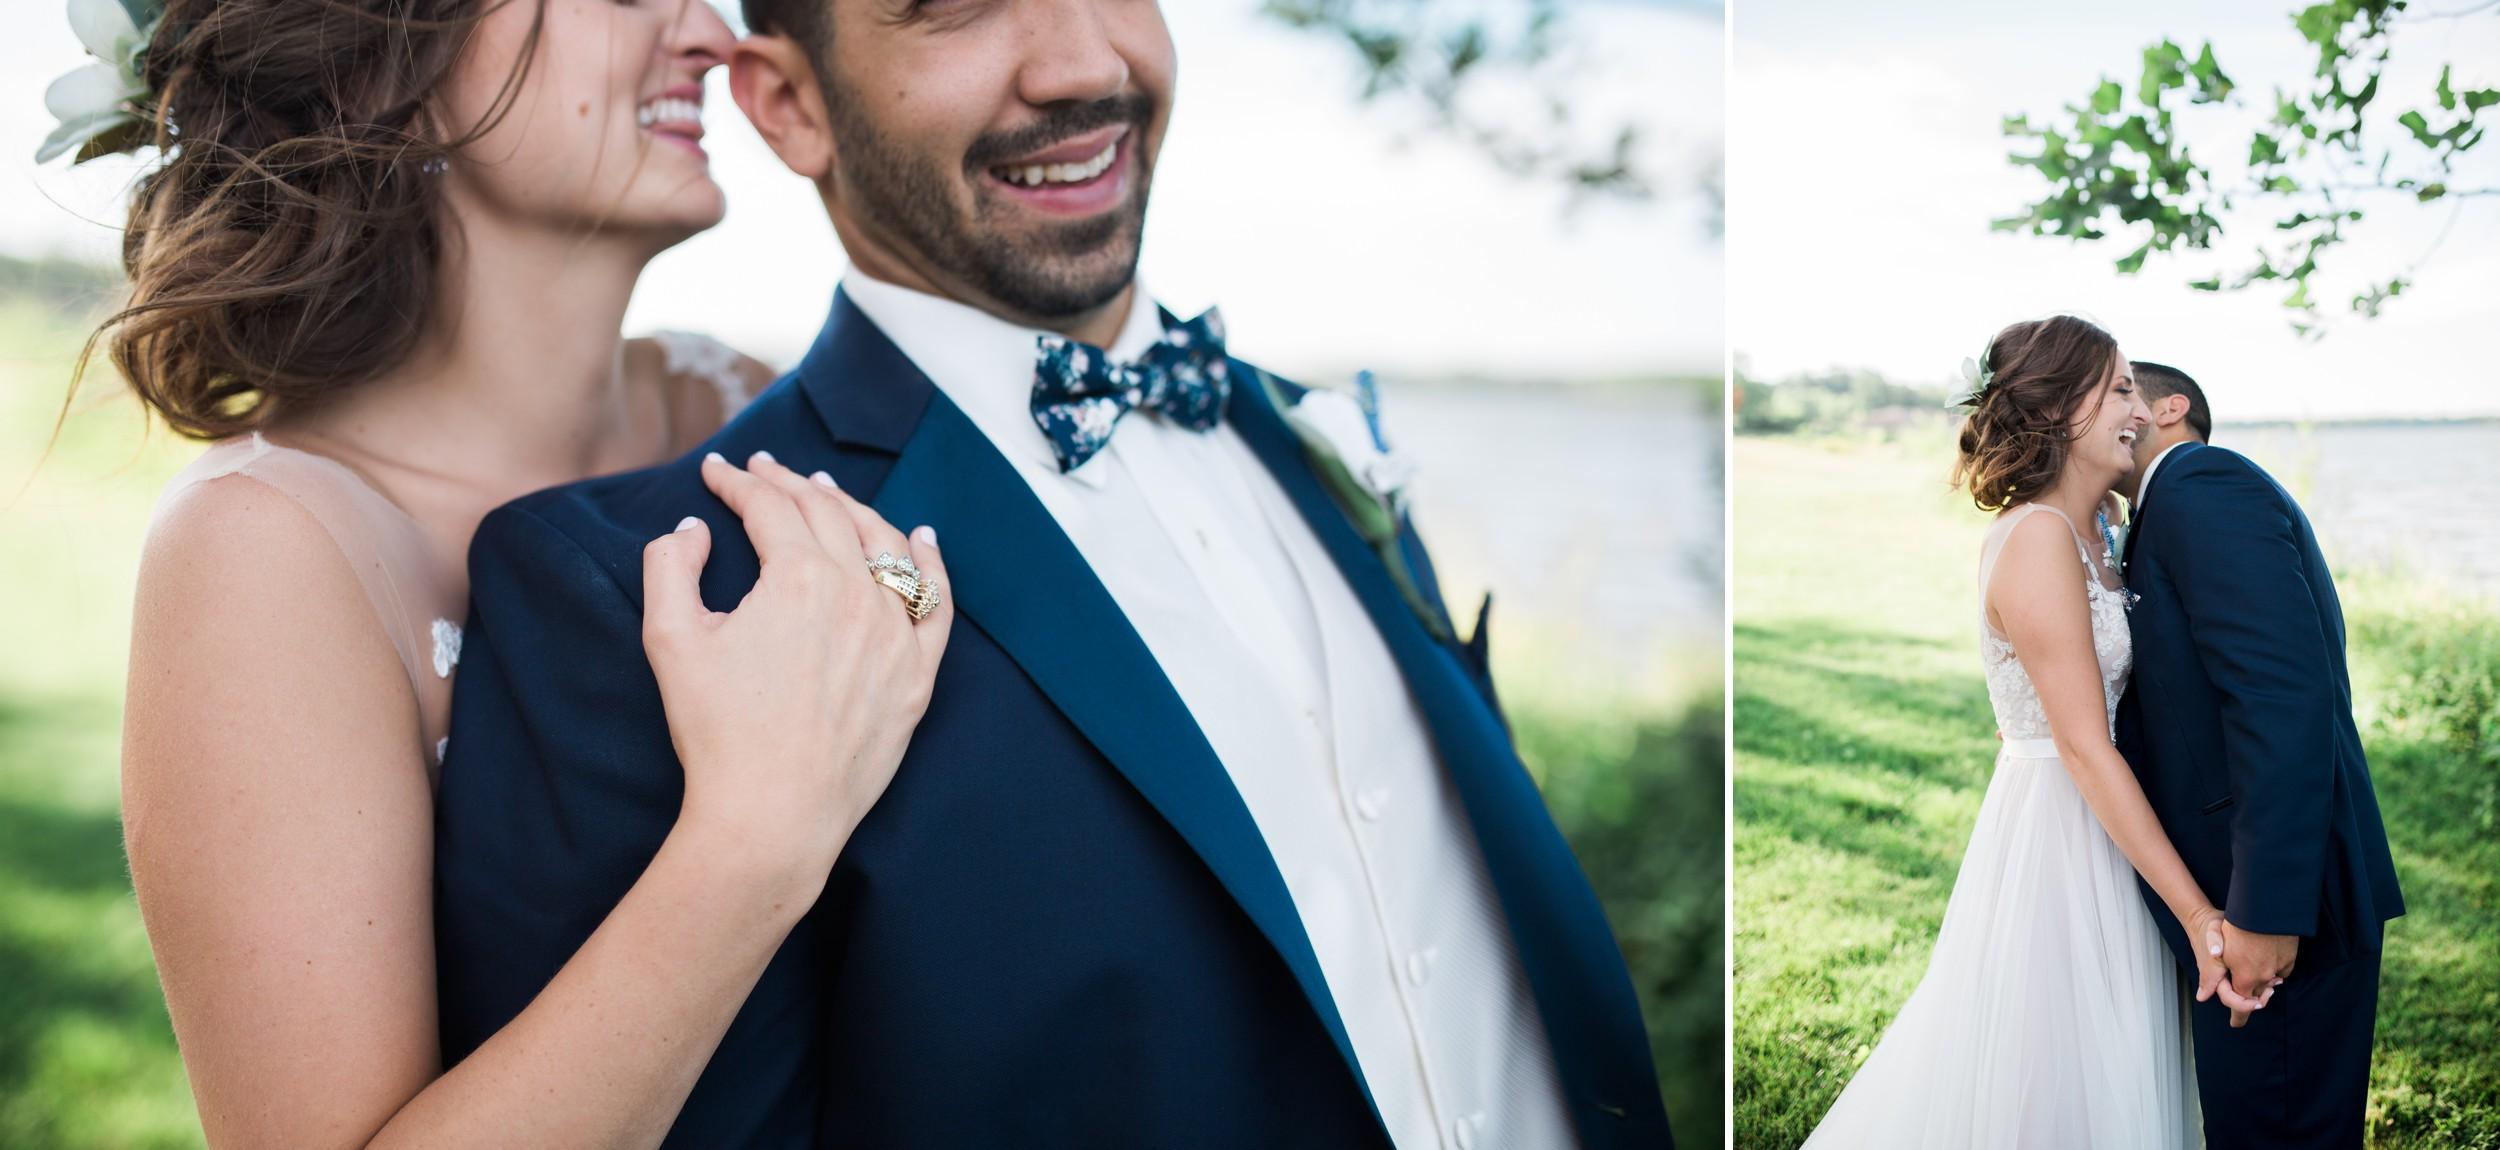 Nick-and-martina-pinelake-vinyards-wedding-columbiana-ohio-tracylynn-photography 24.jpg